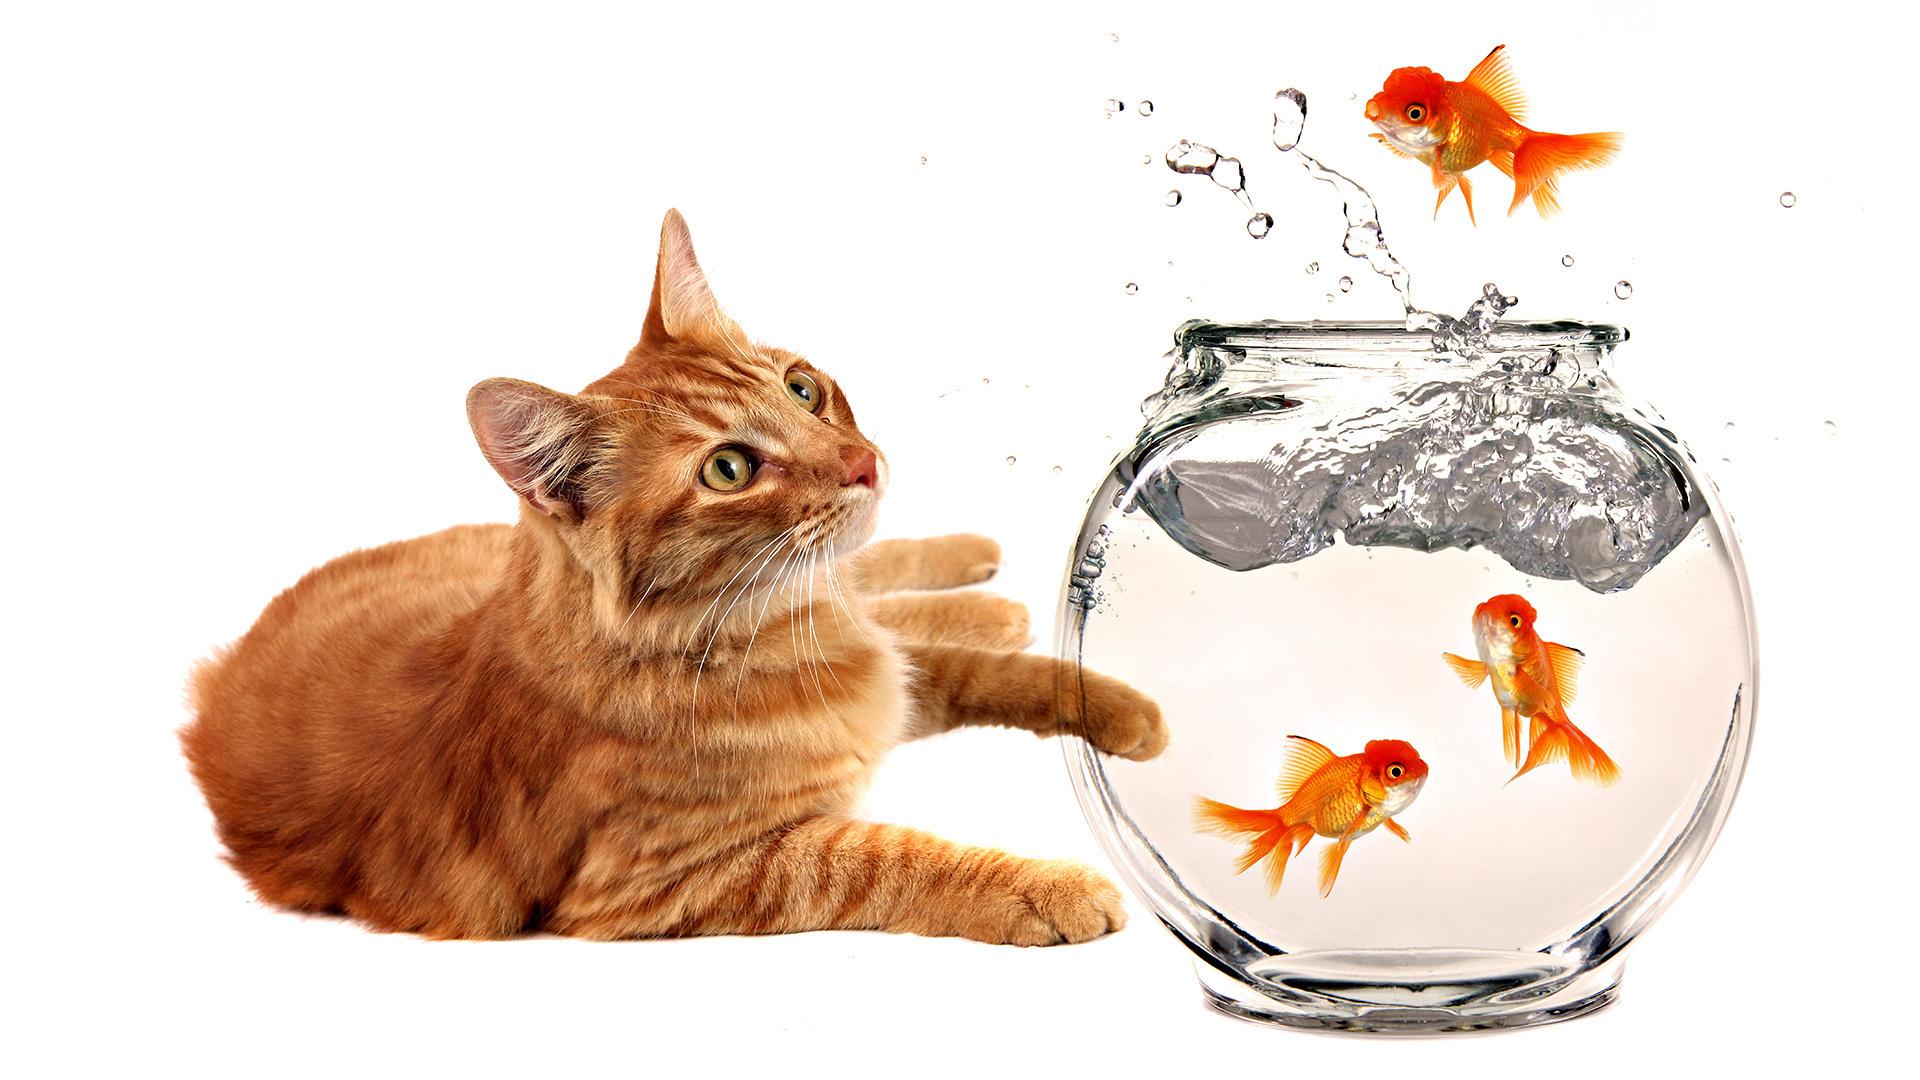 картинки кошек собак рыбок побывали